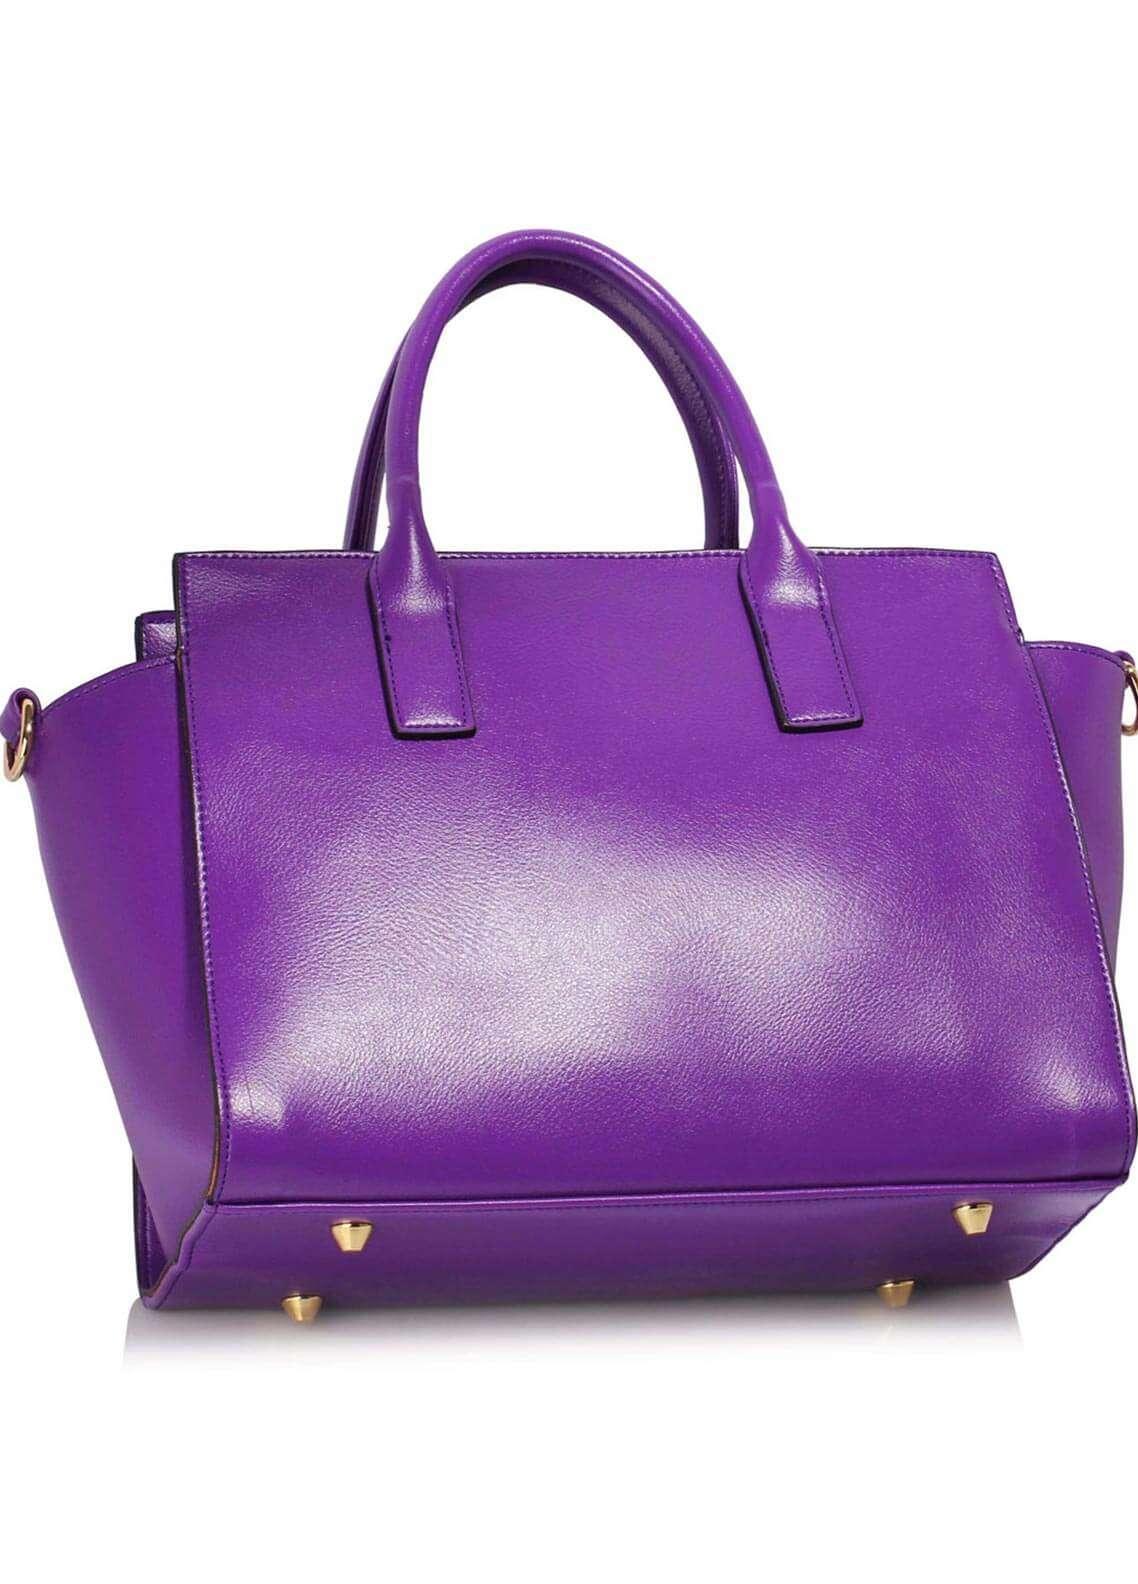 Leesun London  Faux Leather Shoulder  Bags for Woman - Purple